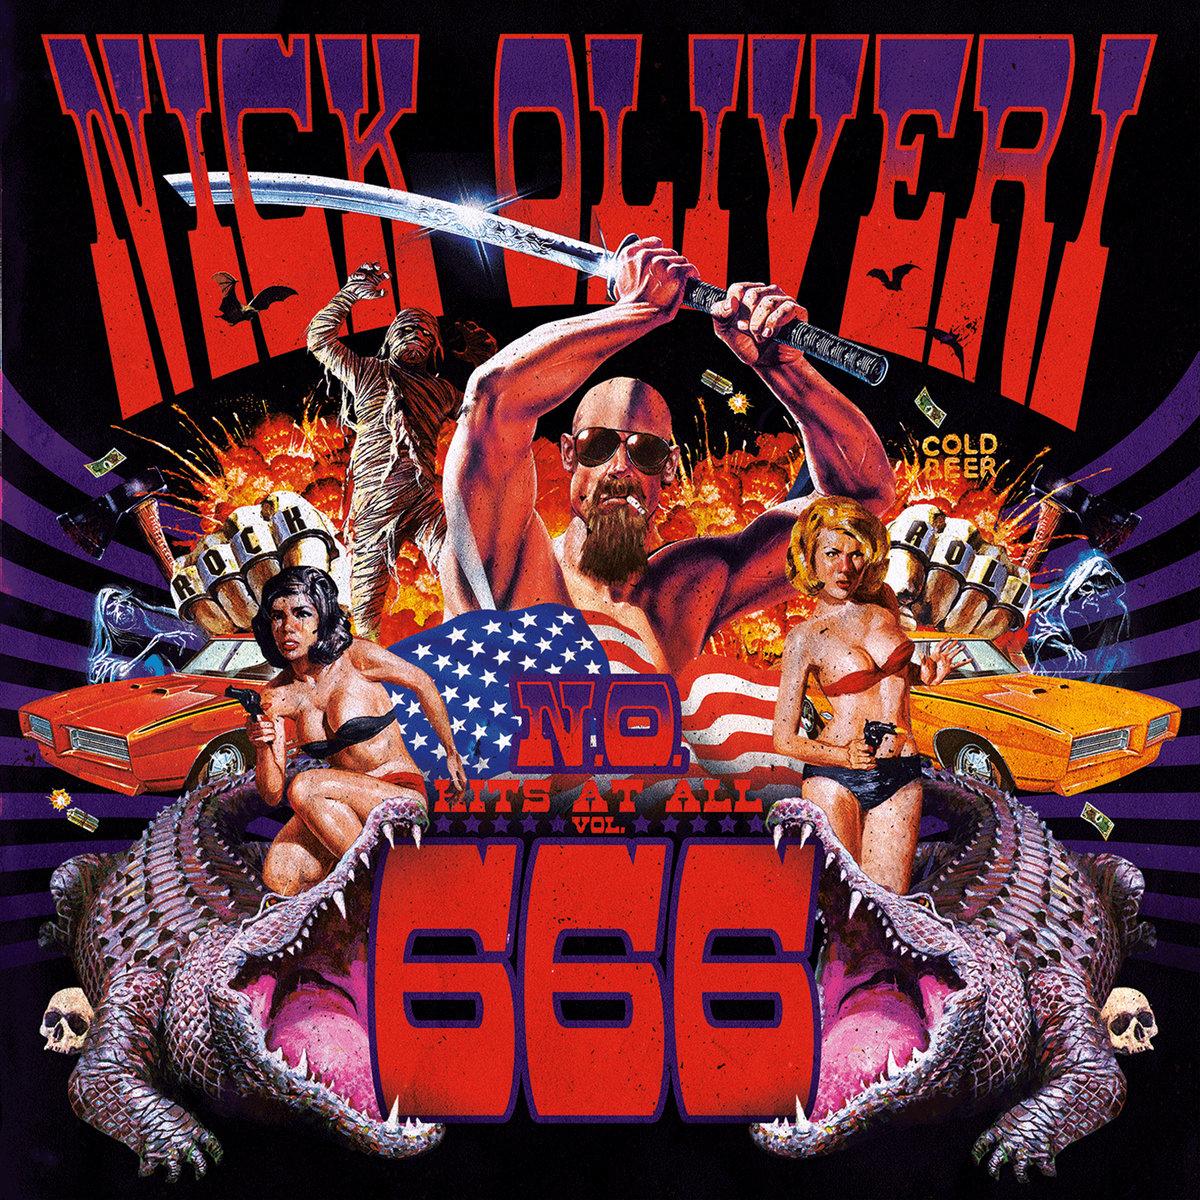 Nick Oliveri - N.O. Hits At All Vol. 666 [LP]